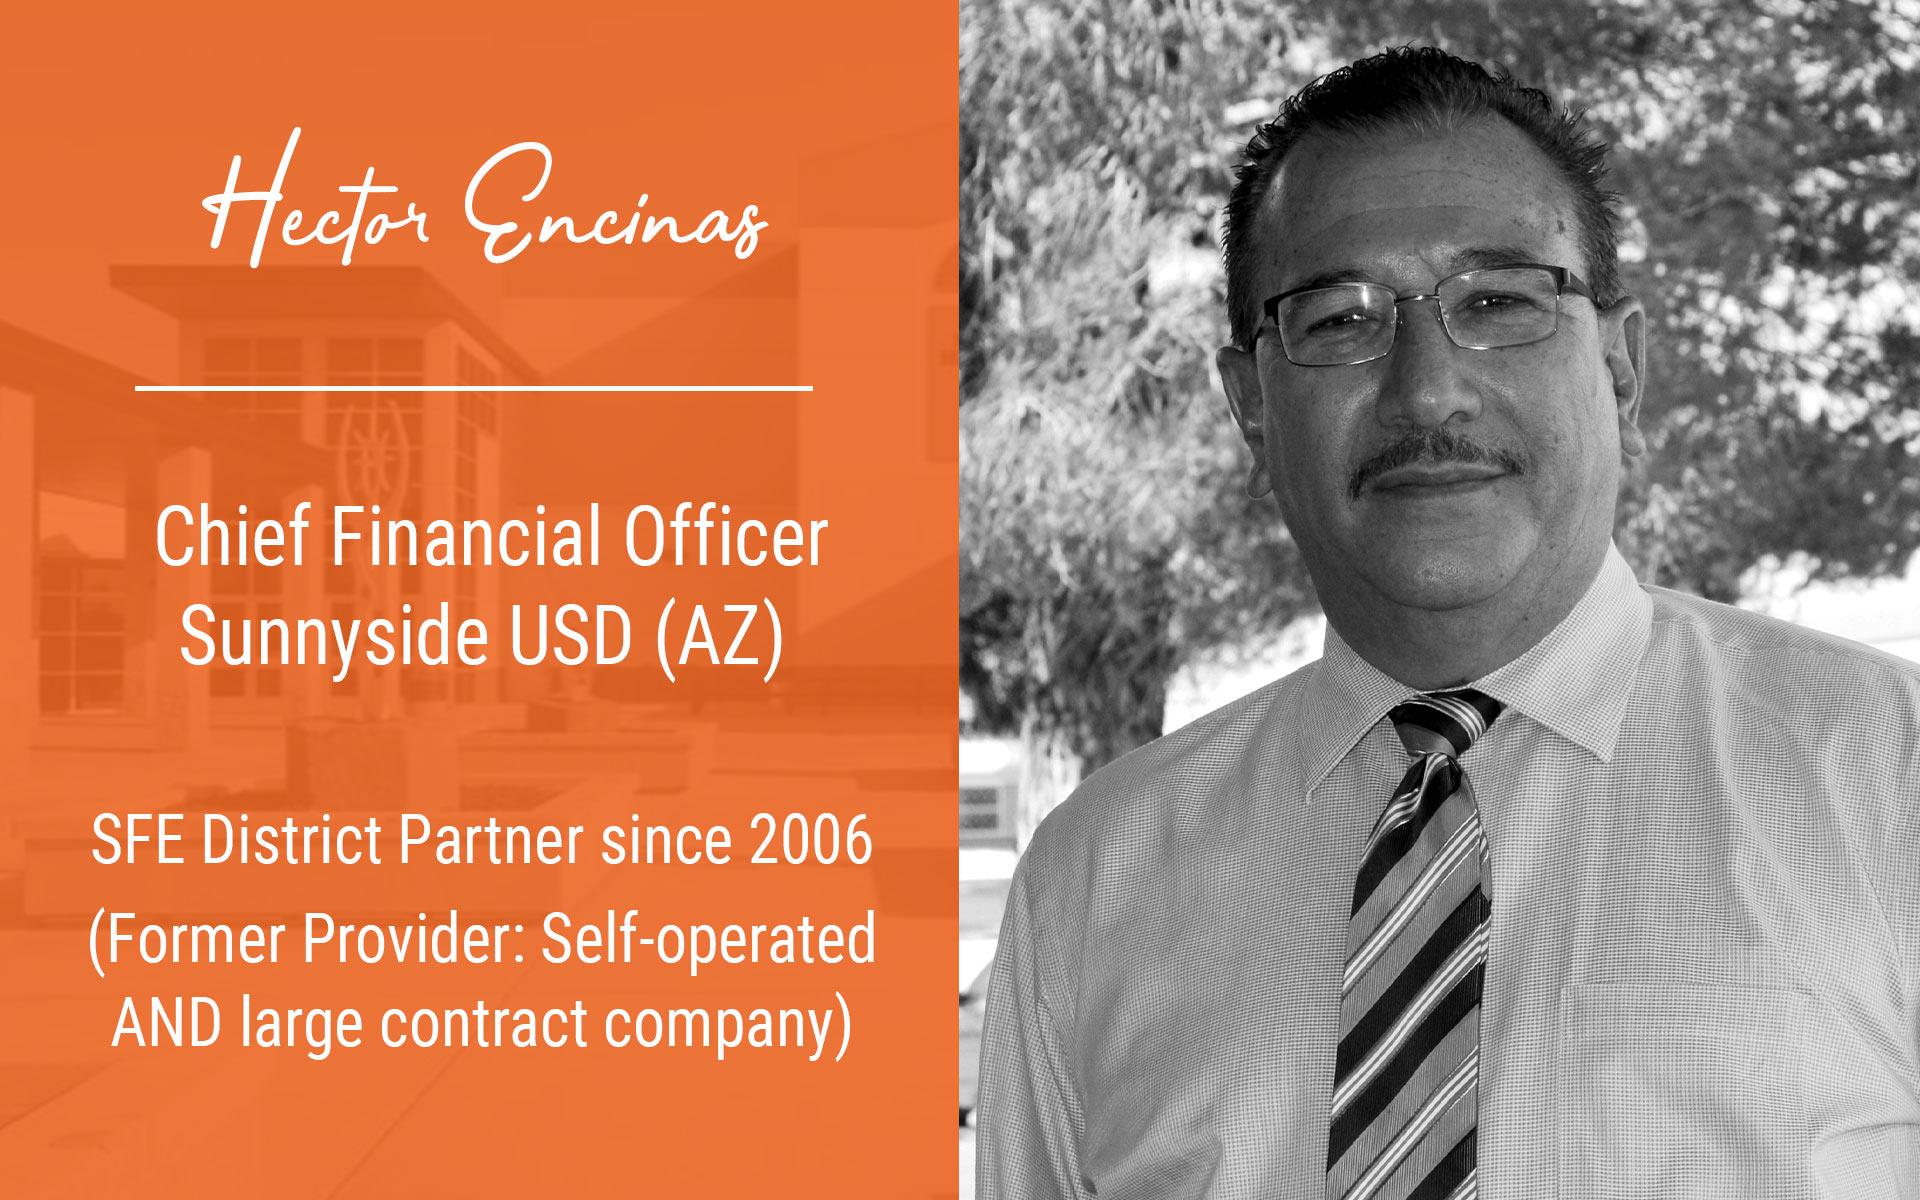 Success Story featuring Hector Encinas | Chief Financial Officer Sunnyside USD (AZ)